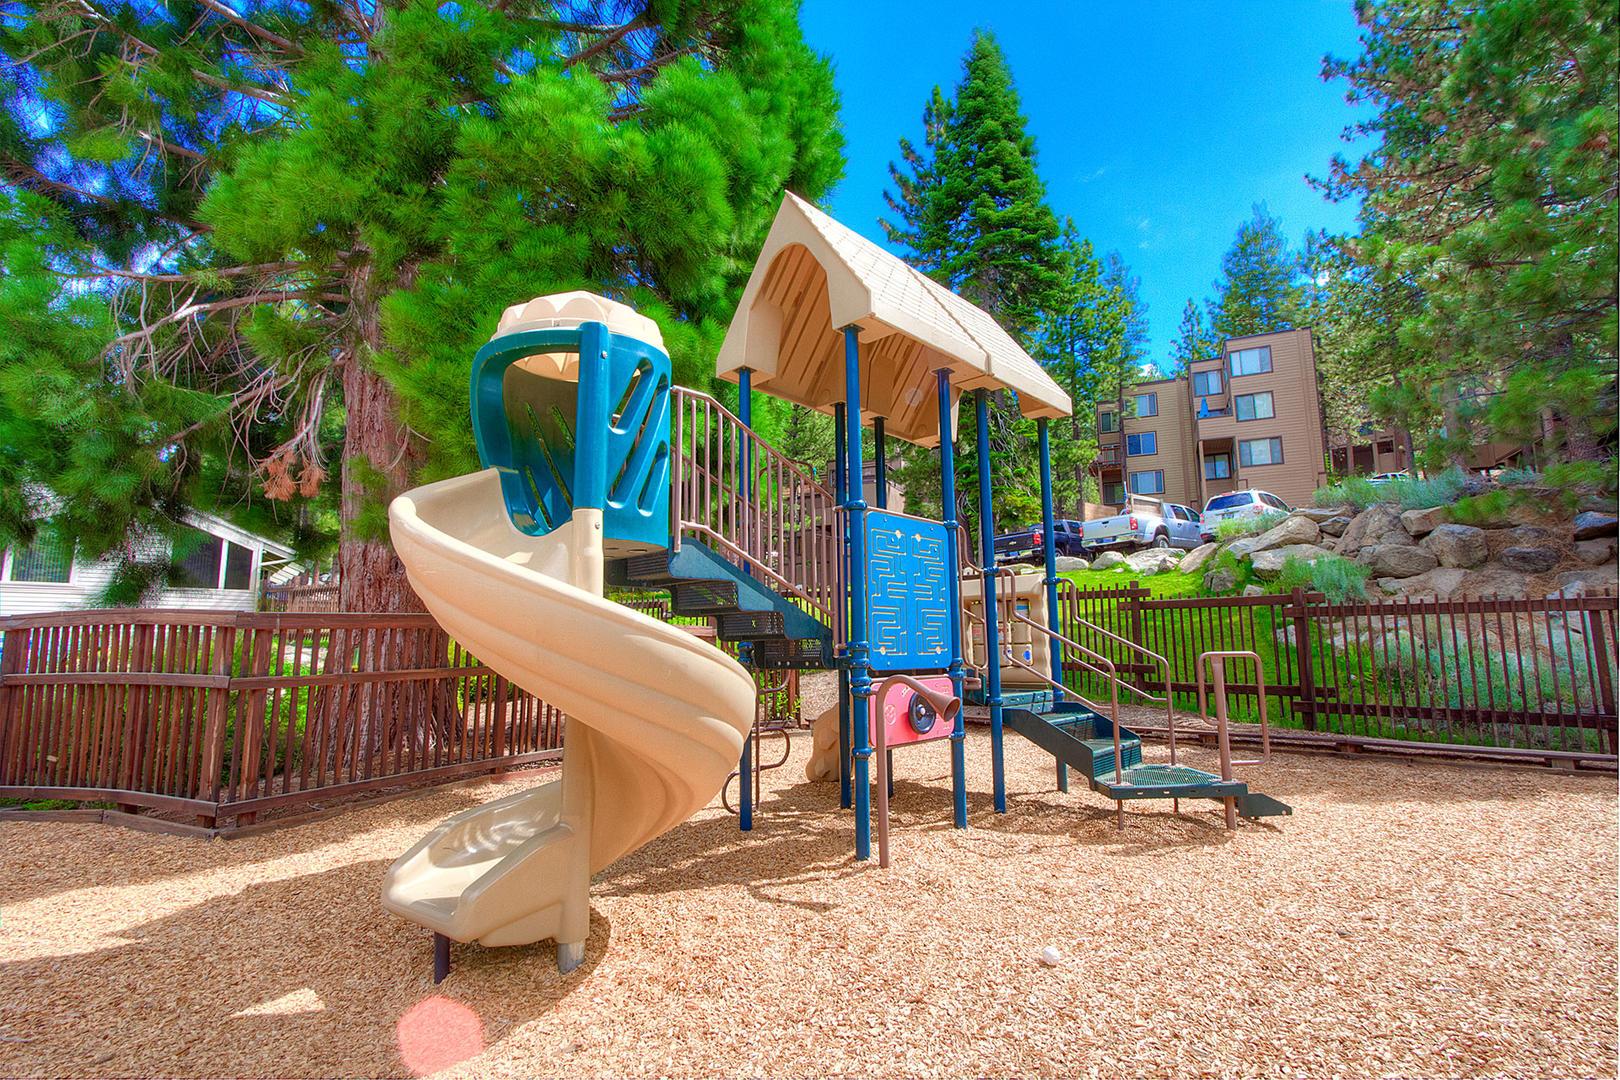 LVC0838 Playground